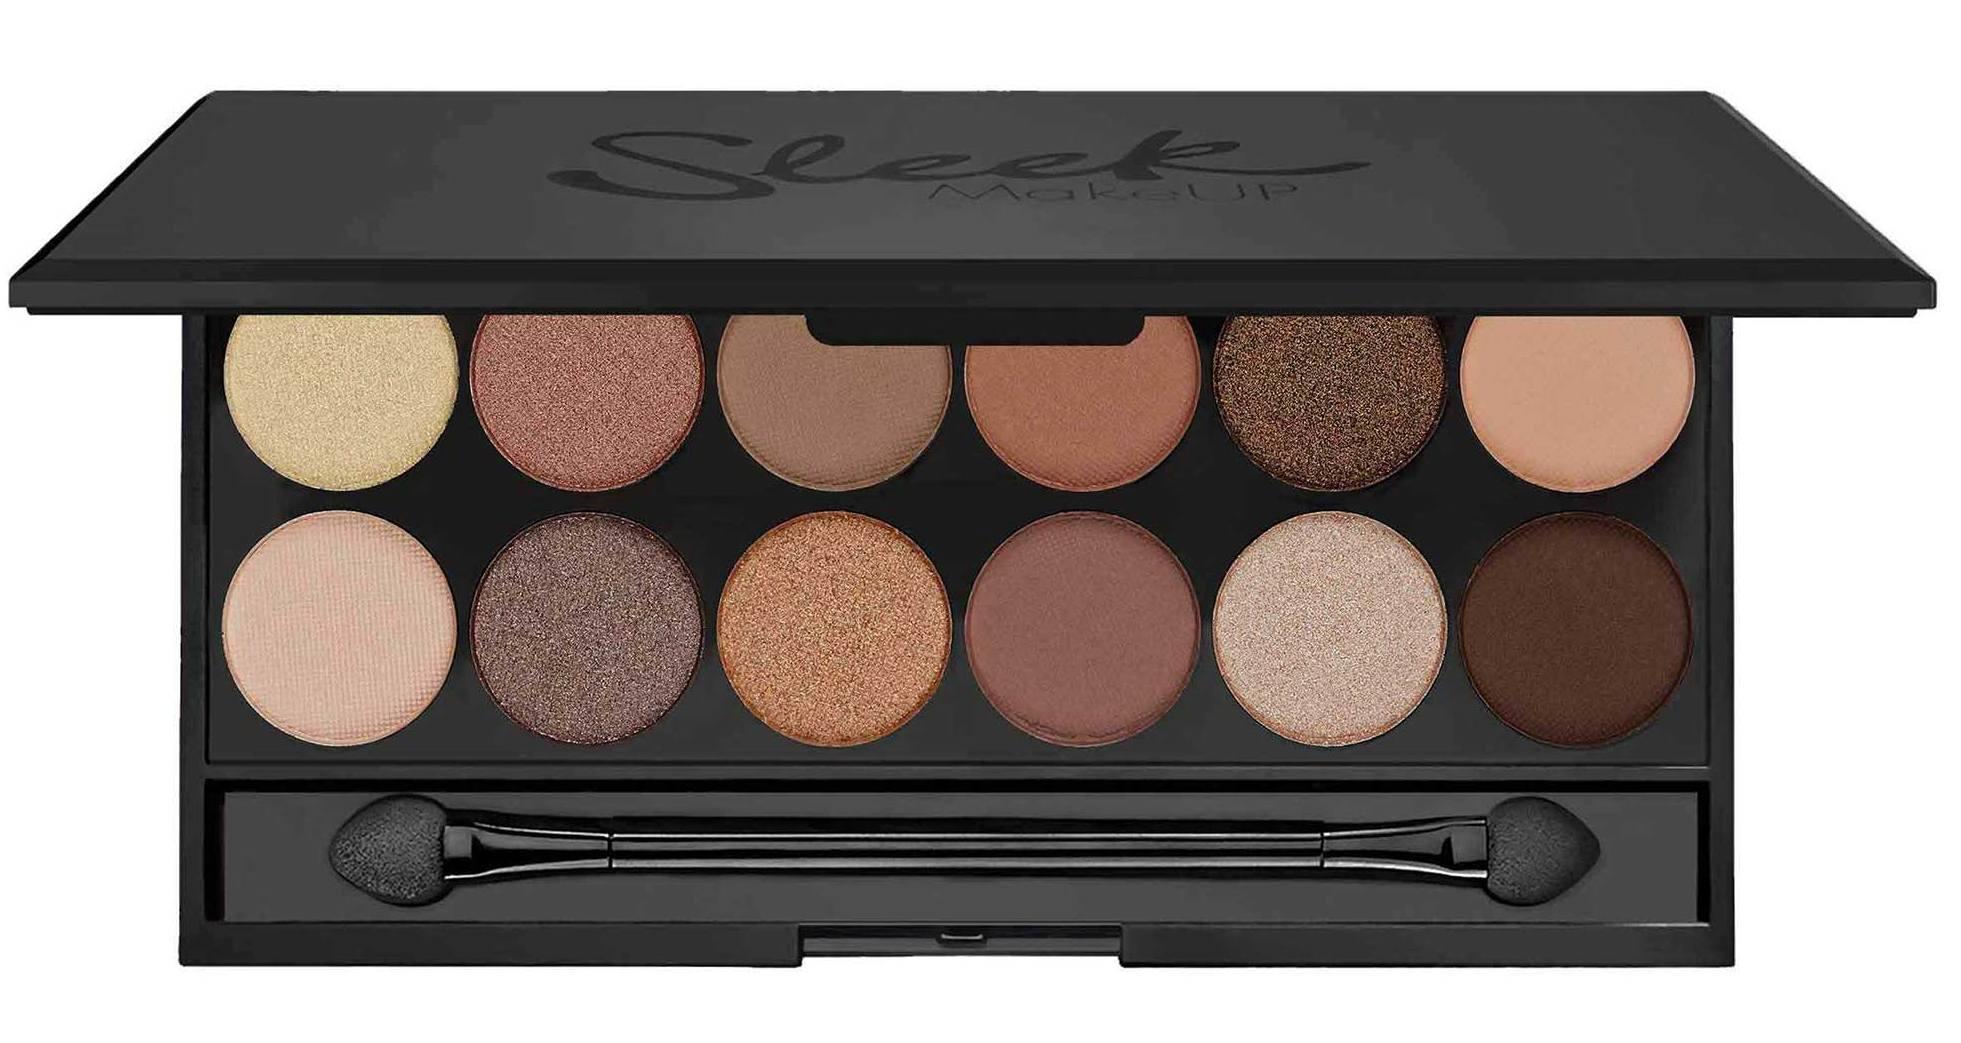 SLEEK MakeUP Палетка теней для век, 12 тонов / A New Day Eyeshadow Palette I-Divine 119 г - Тени